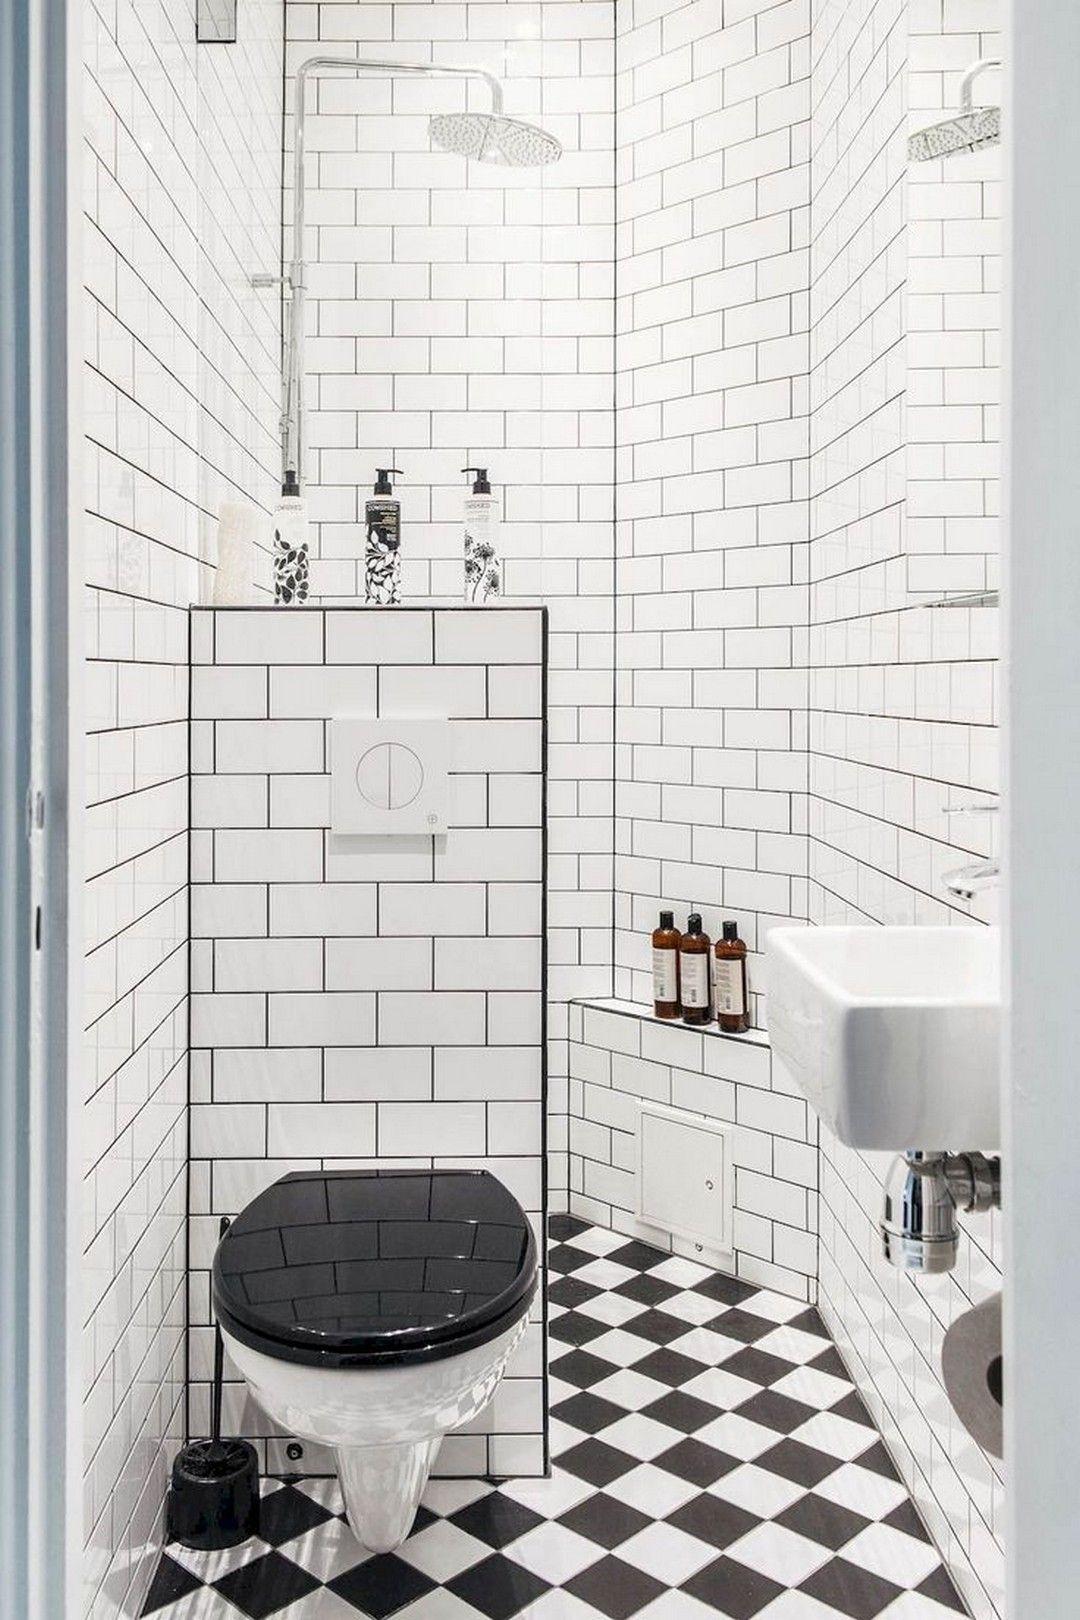 24 Delicate Bathroom Design Ideas For Small Apartment On A Budget Small Bathroom Decor Small Bathroom Bathroom Layout